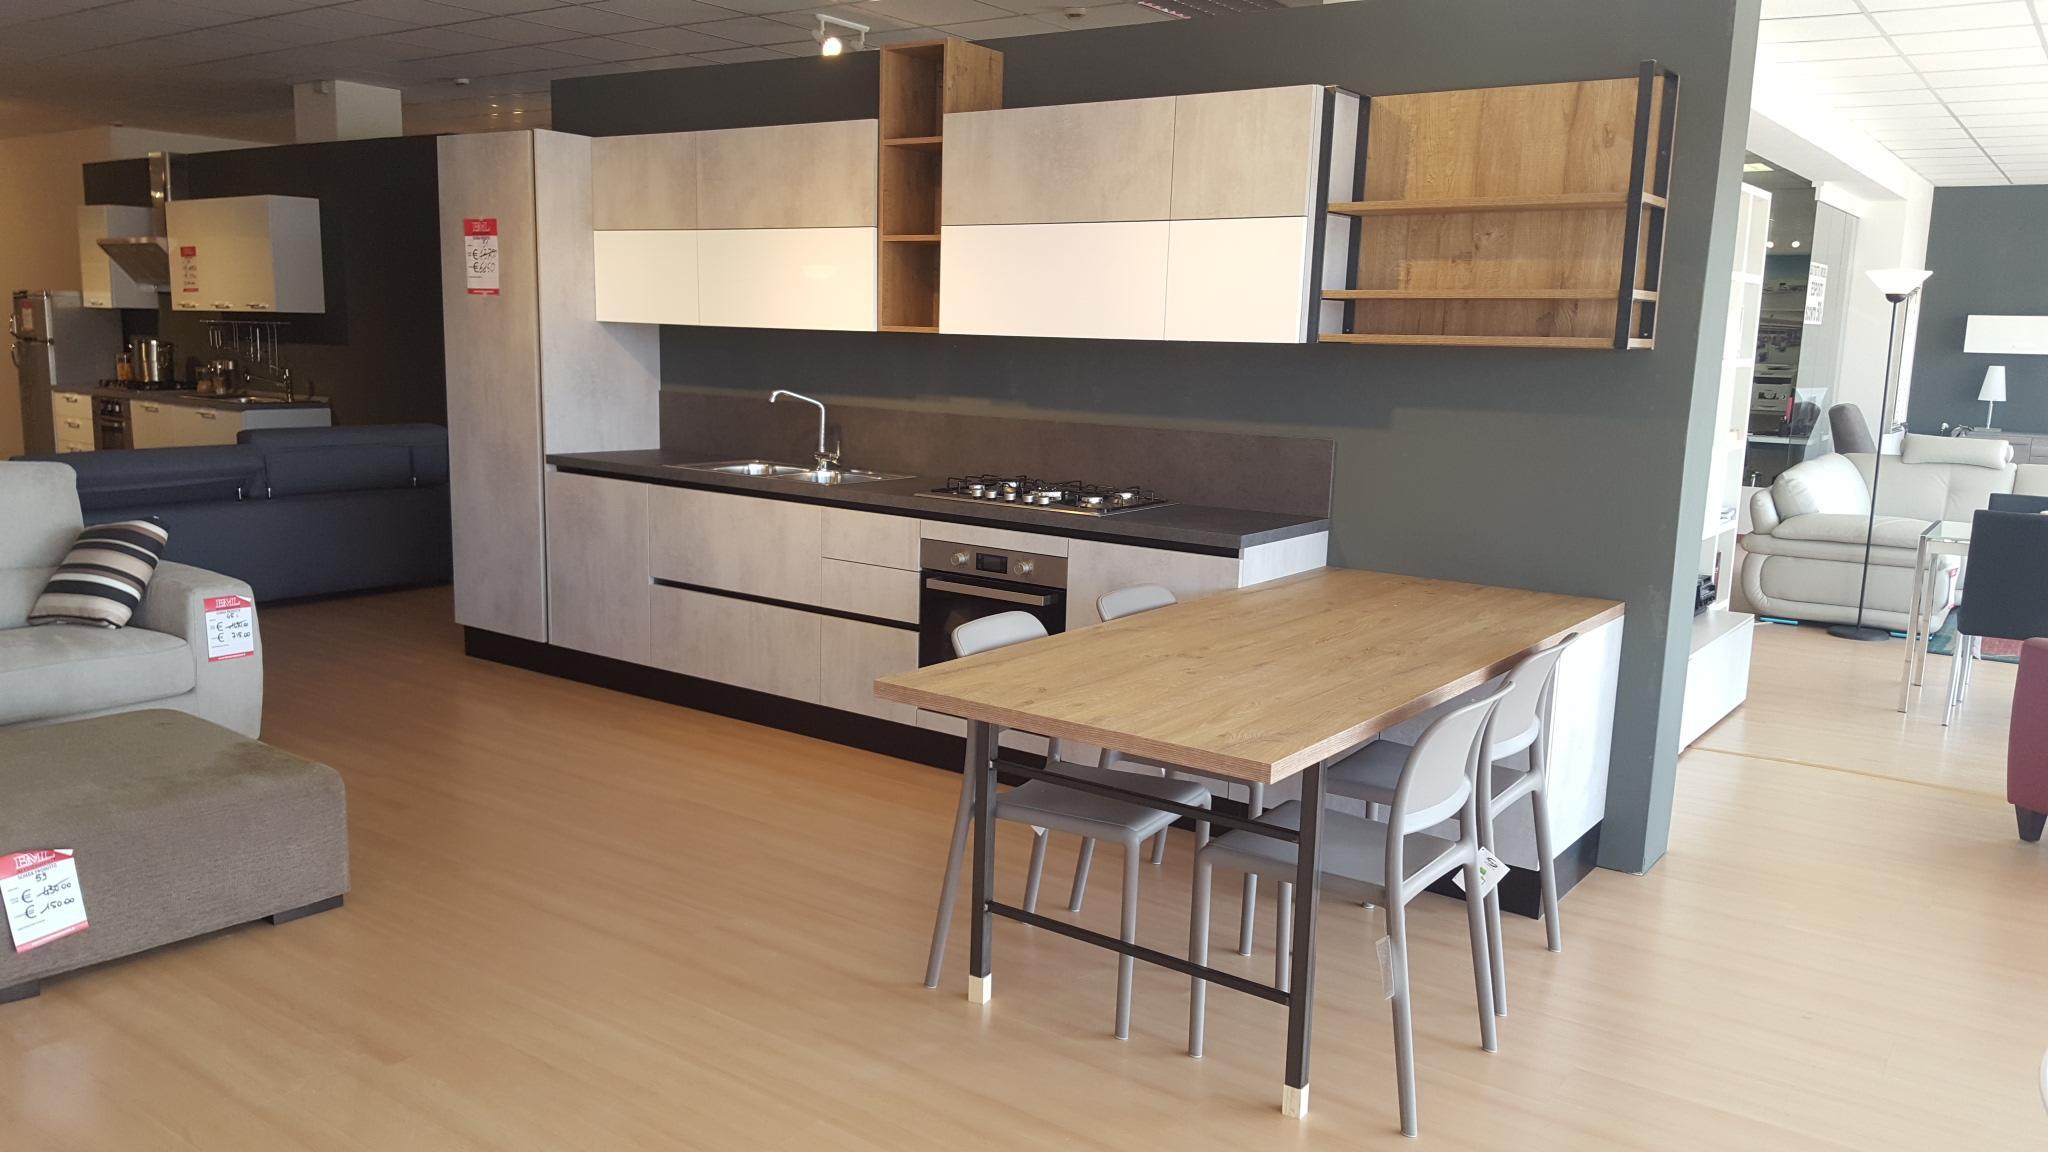 Cucina tre finiture outlet mobili e arredamento for Outlet arredamento vicenza